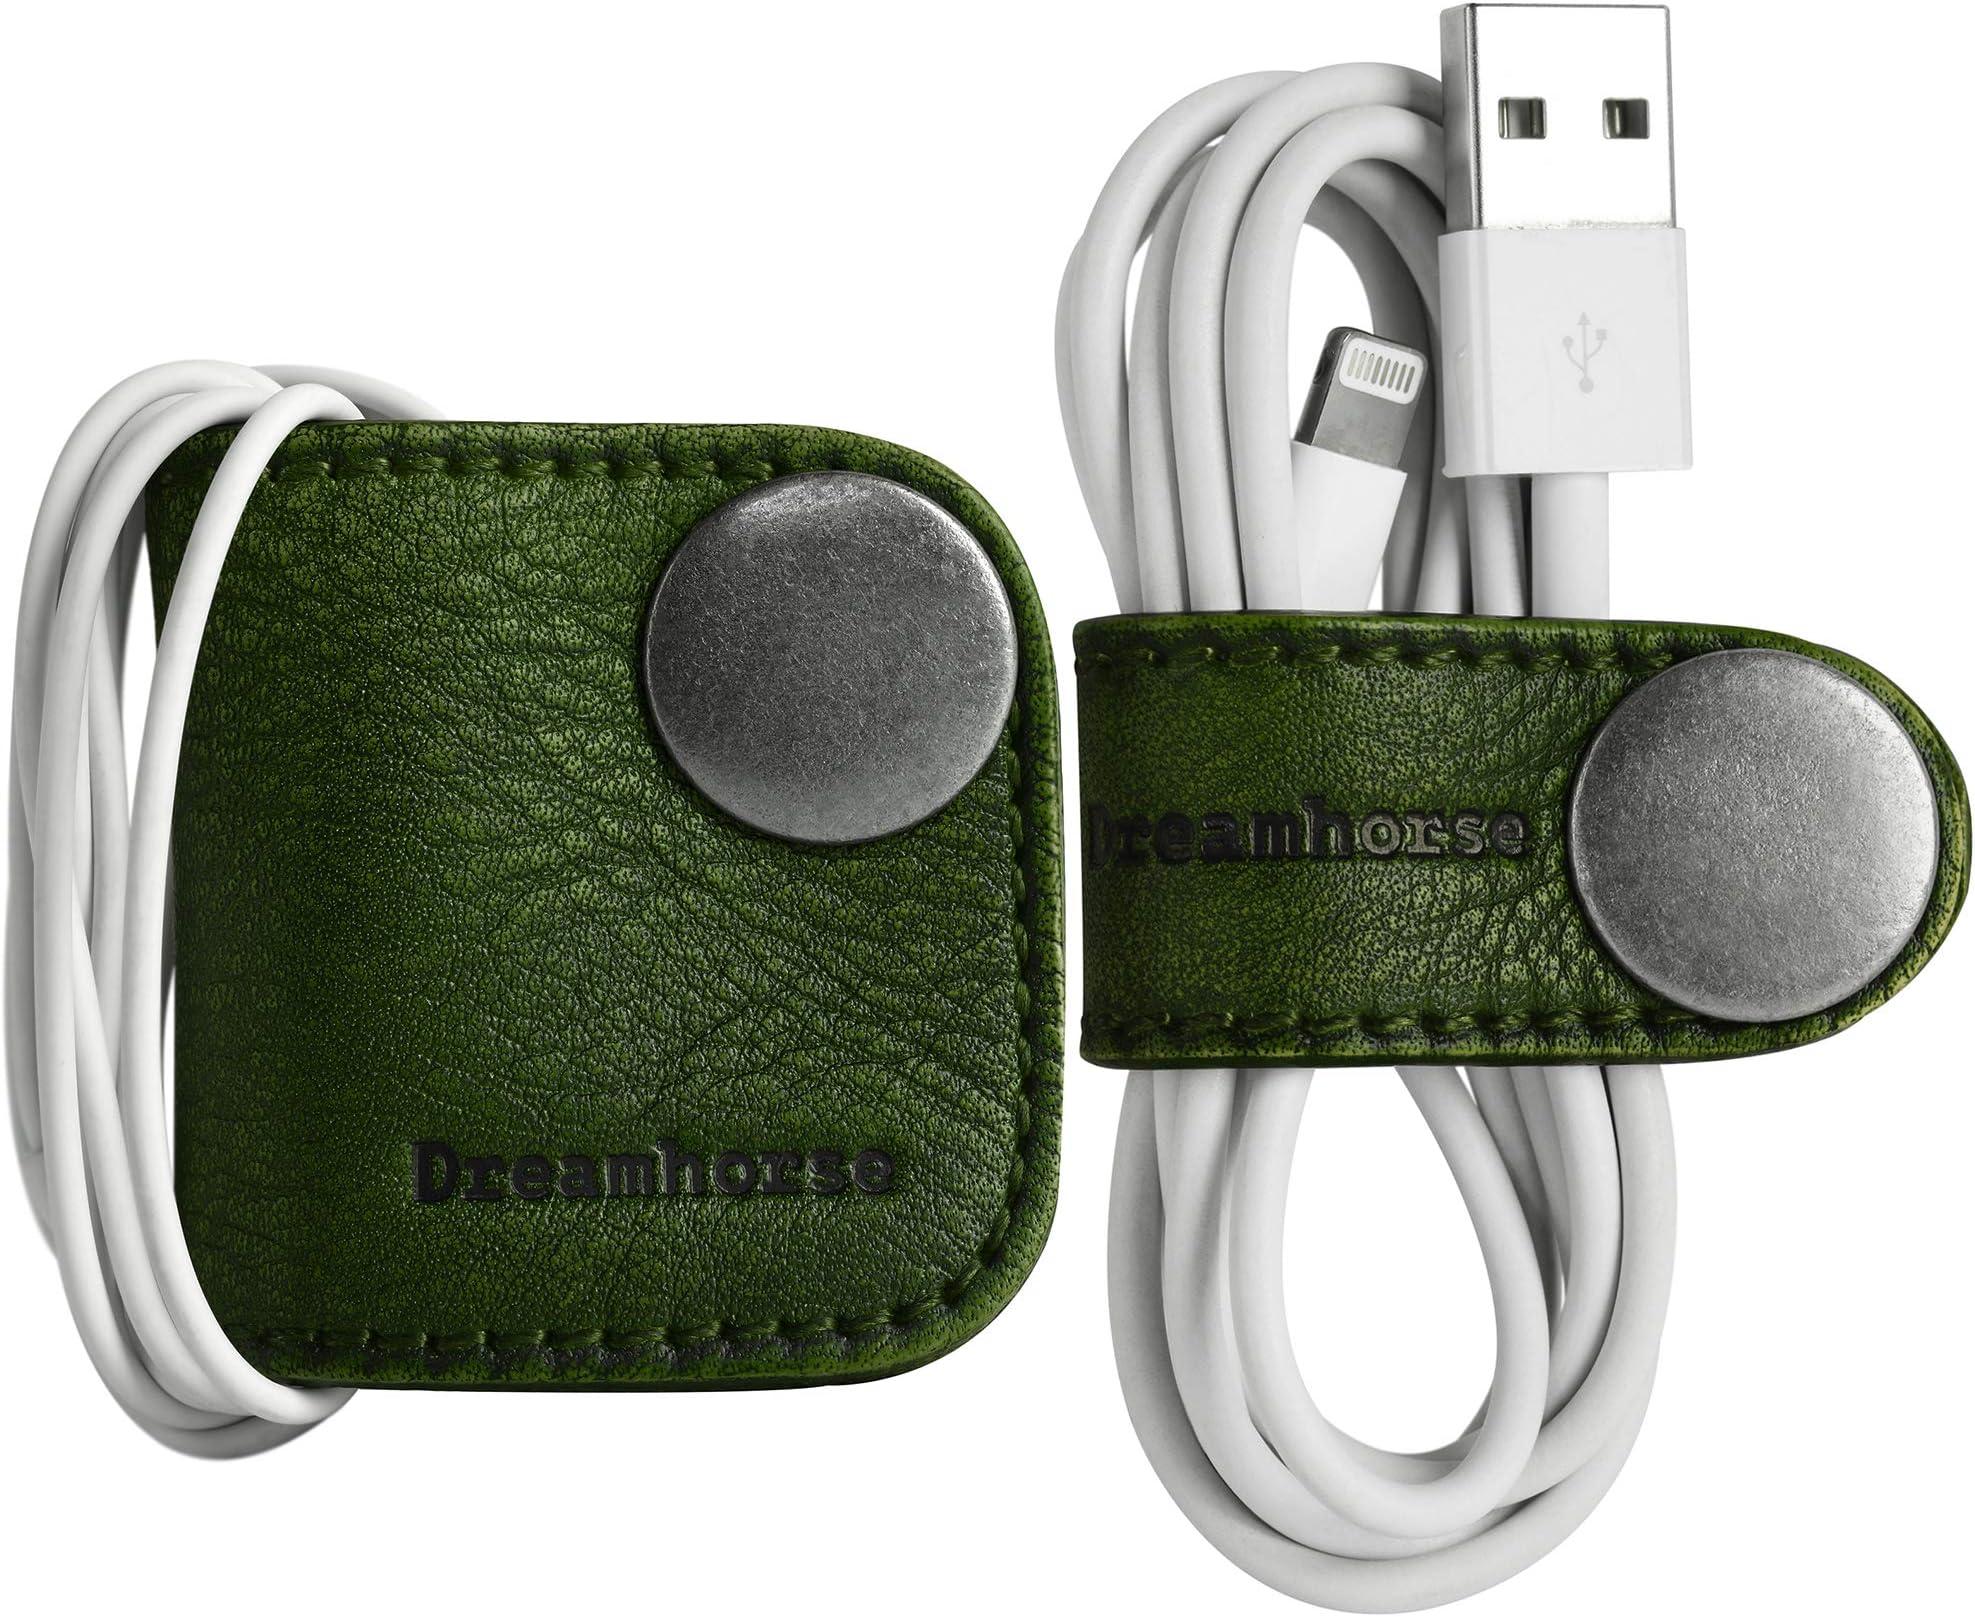 Headphone Organizer Zebra Cord Keeper Wrap Earbud Organizer Gift Charger Cord Keeper Holder Organizer iPhone Cord Organizer